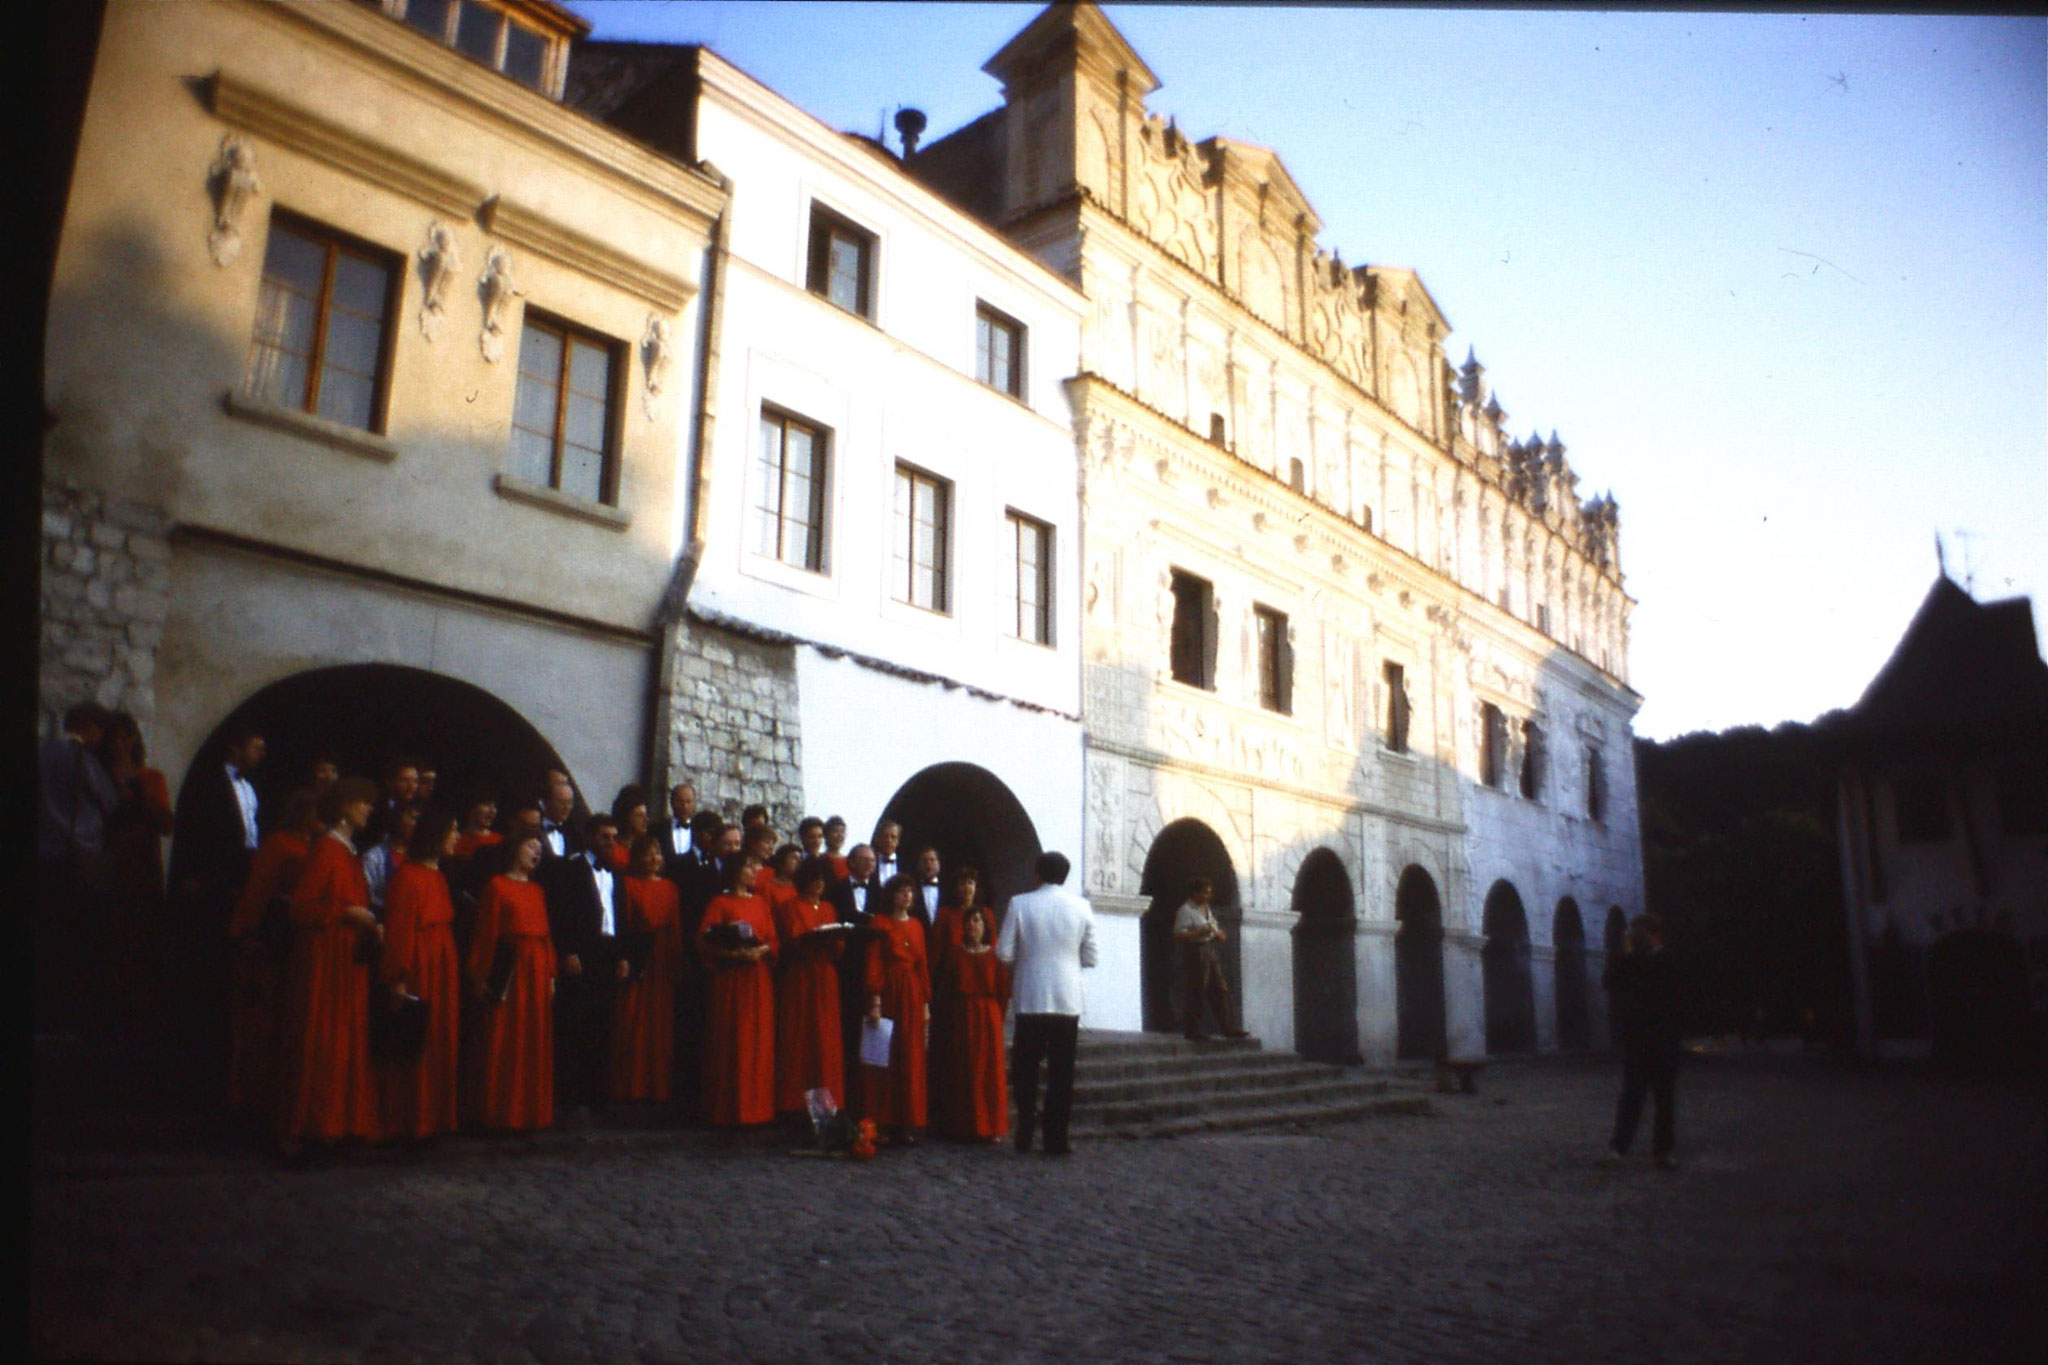 27/8/1988: 11: London Chorale at Kazimierz Dolny